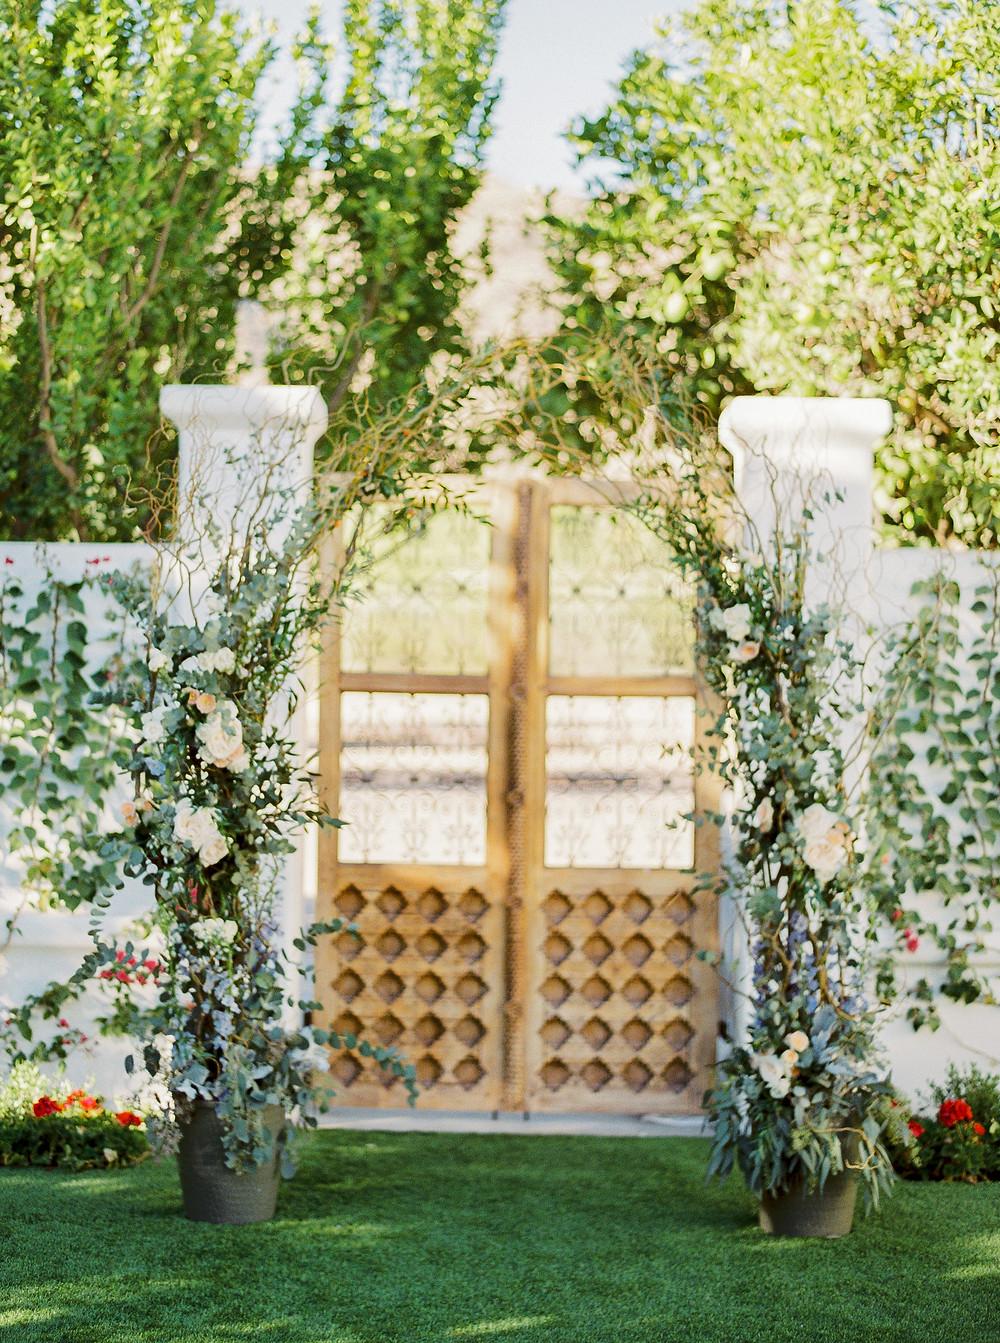 El Chorro Wedding, Traditional Chinese Wedding, Ceremony Details